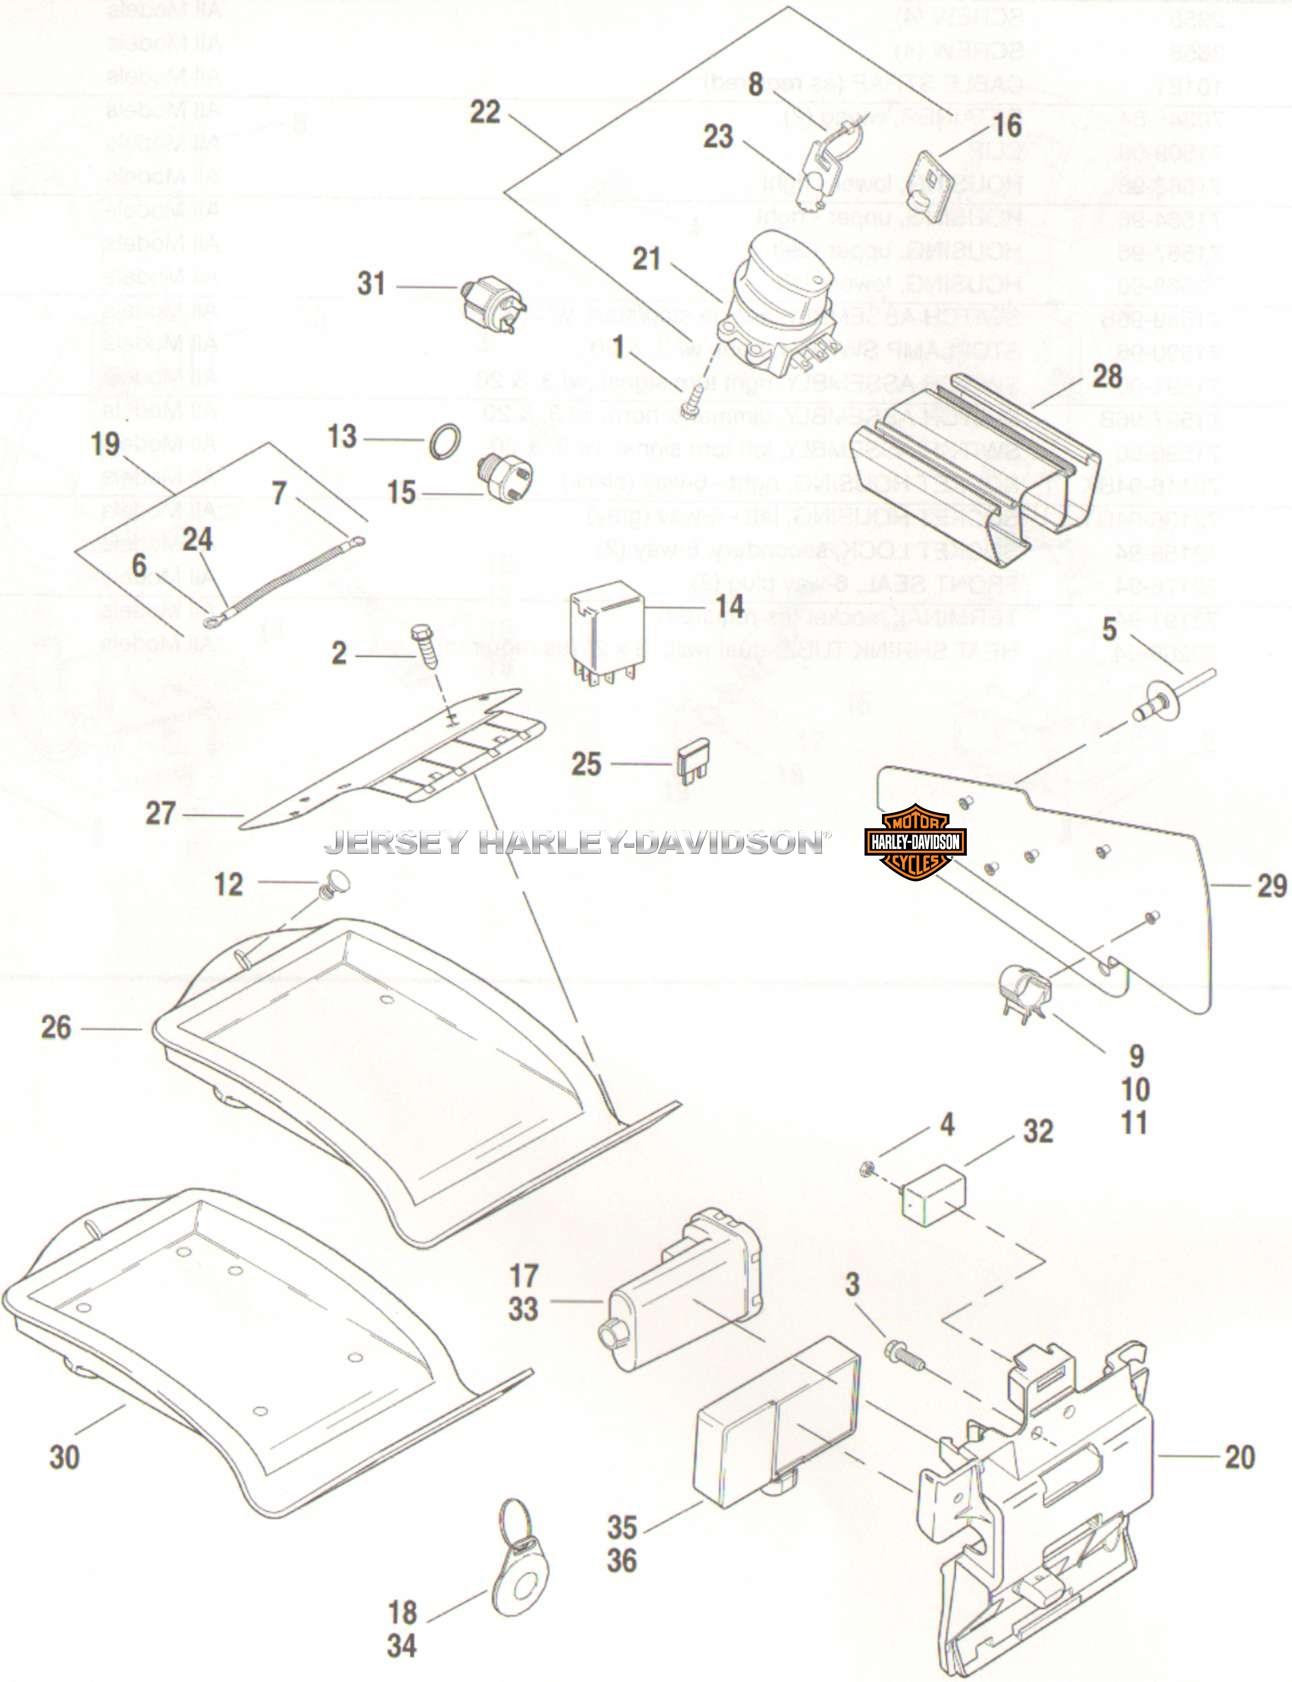 2007 flstc wiring diagram 2007 wiring diagram softail2006 89 2007 flstc wiring diagram